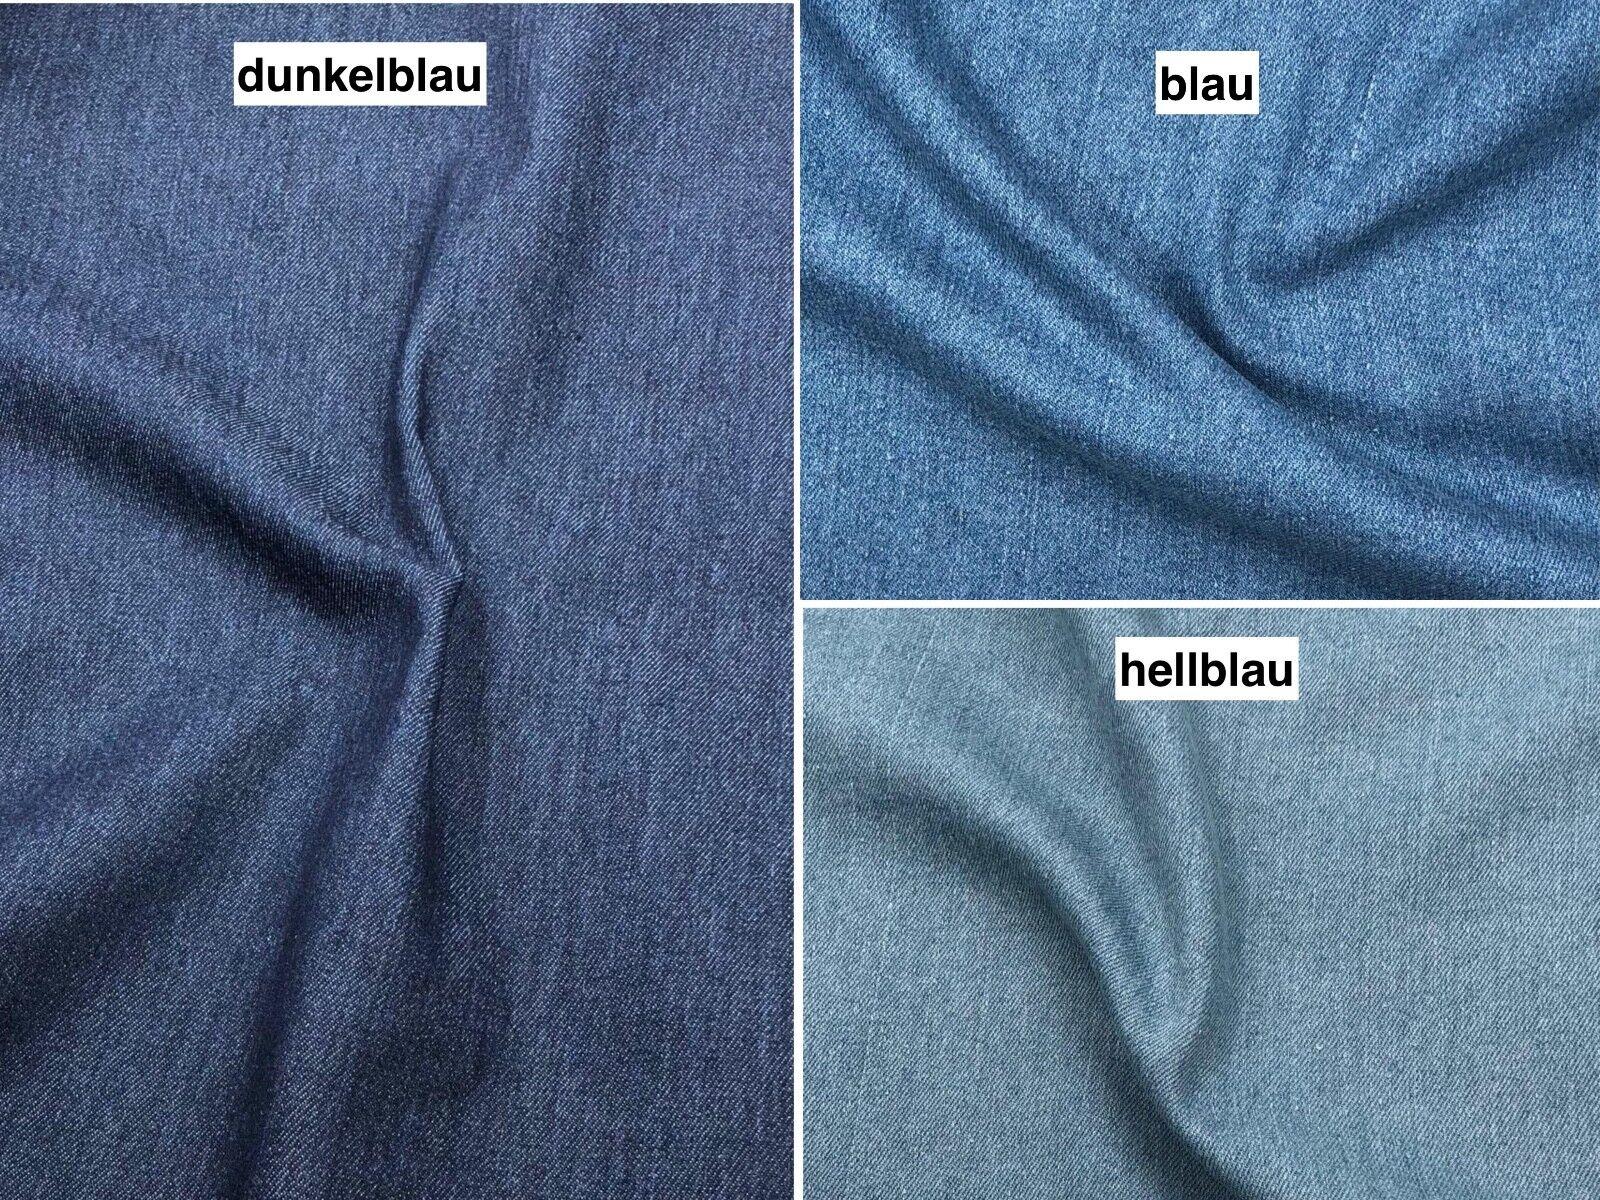 ce55f6773aa42e Jeans Stretch Stoff Test Vergleich +++ Jeans Stretch Stoff kaufen ...